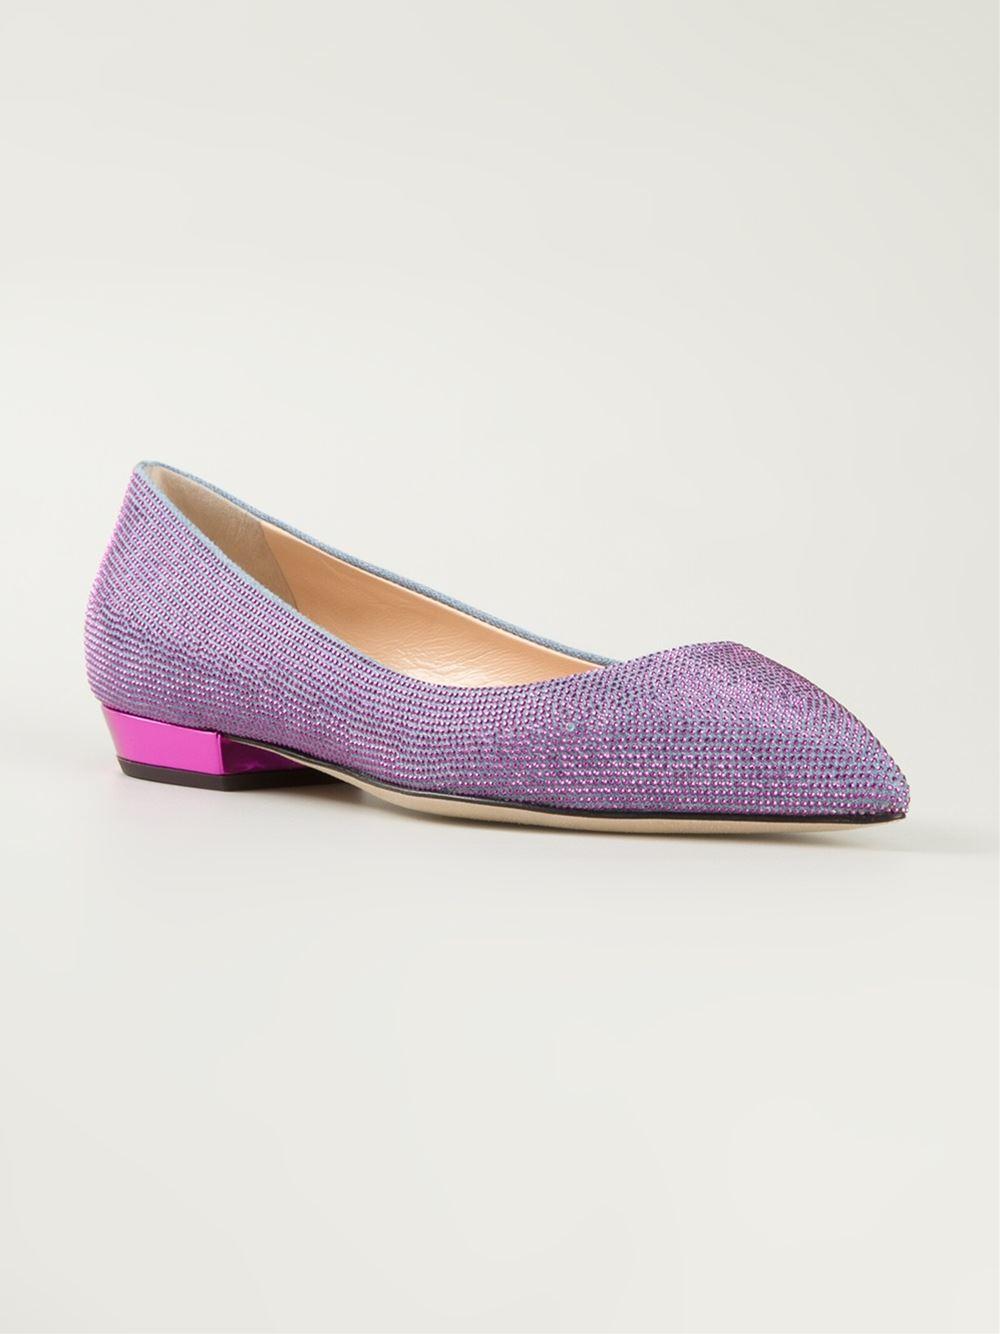 giuseppe zanotti pointed toe glitter ballerinas in pink